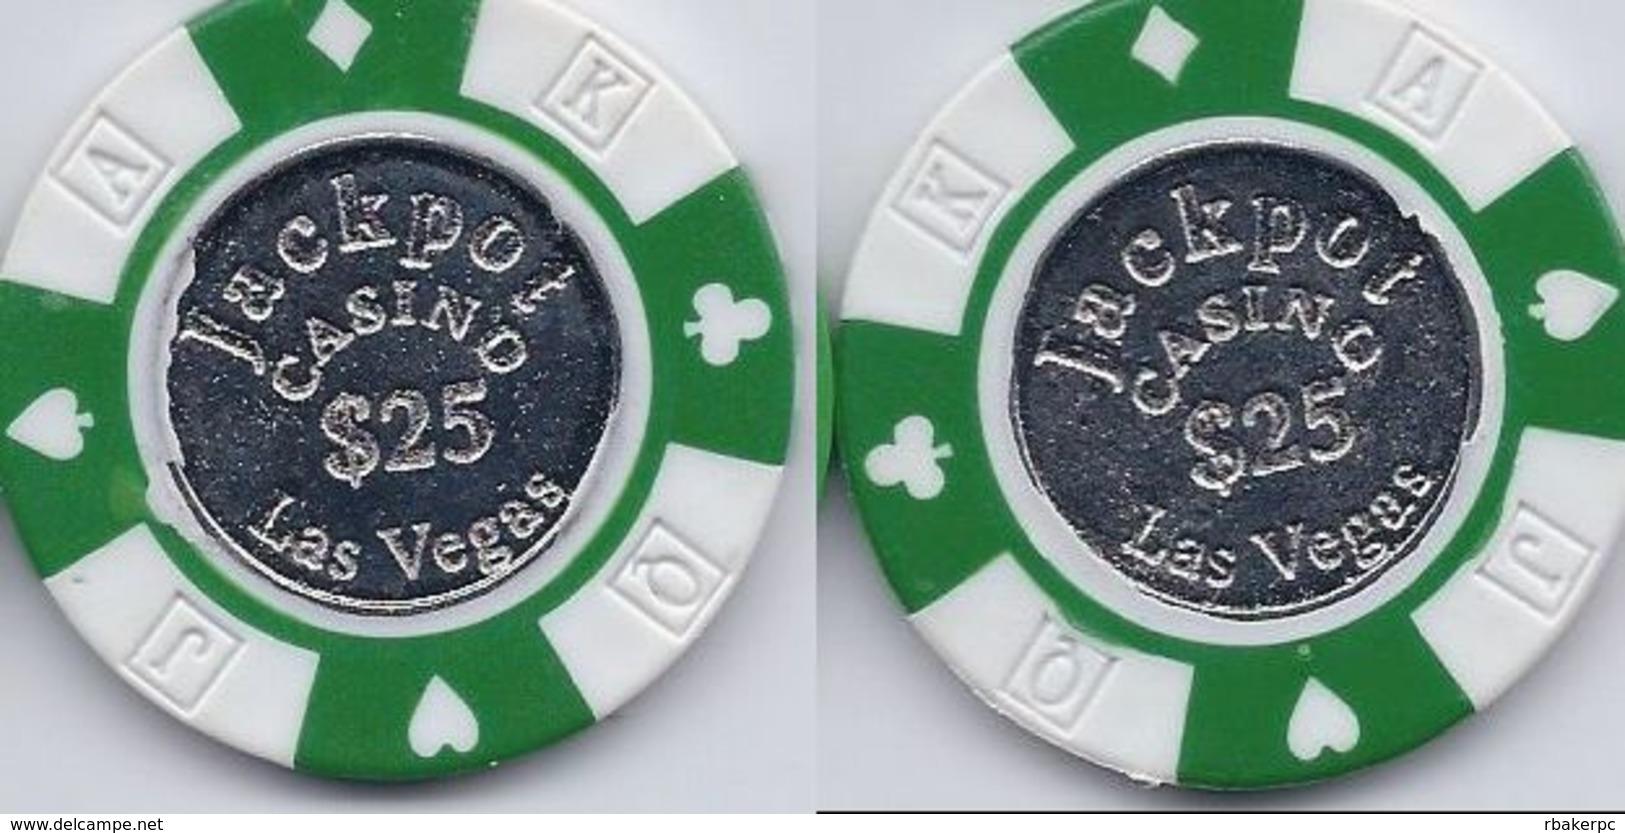 Jackpot Casino Las Vegas $25 Sample/Fantasy Chip - Casino